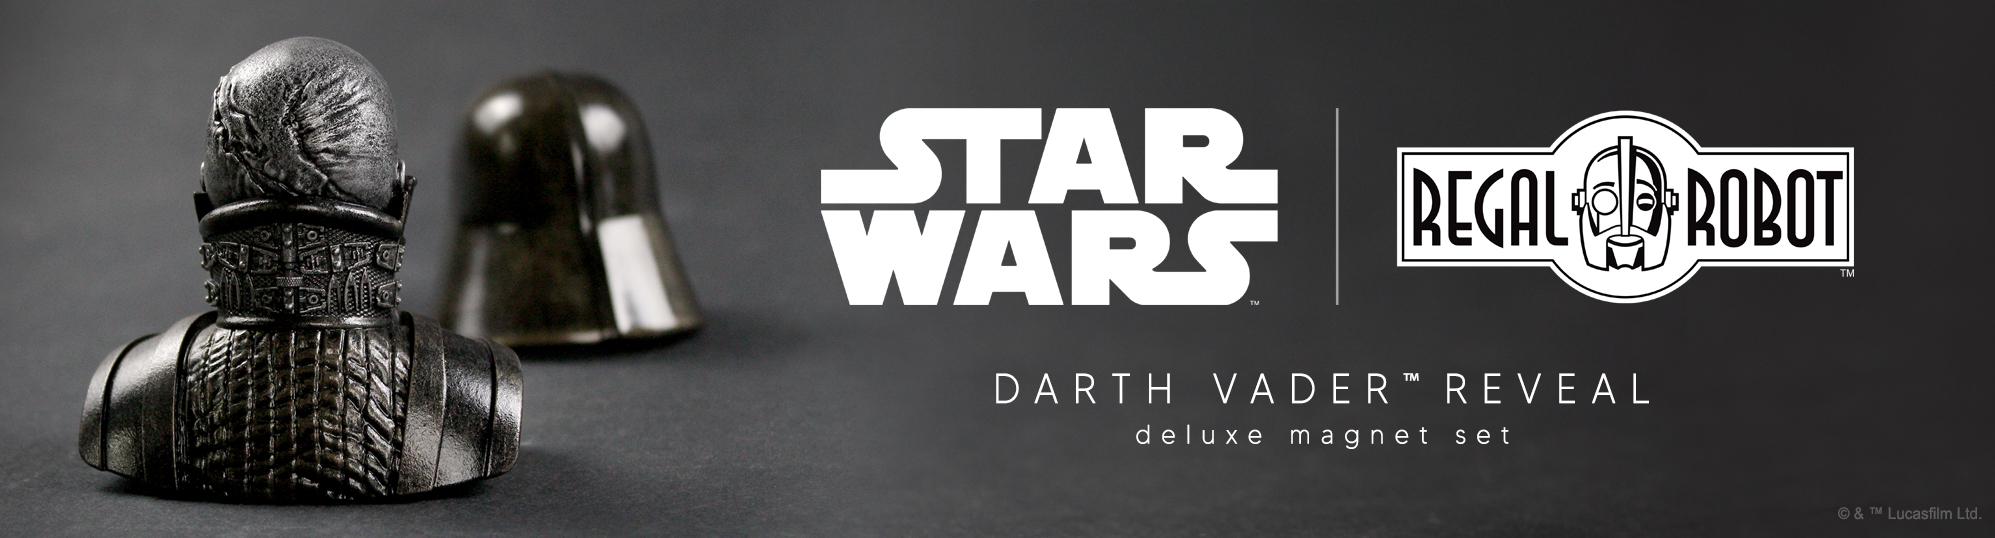 Darth Vader Empire Strikes Back reveal in meditation chamber